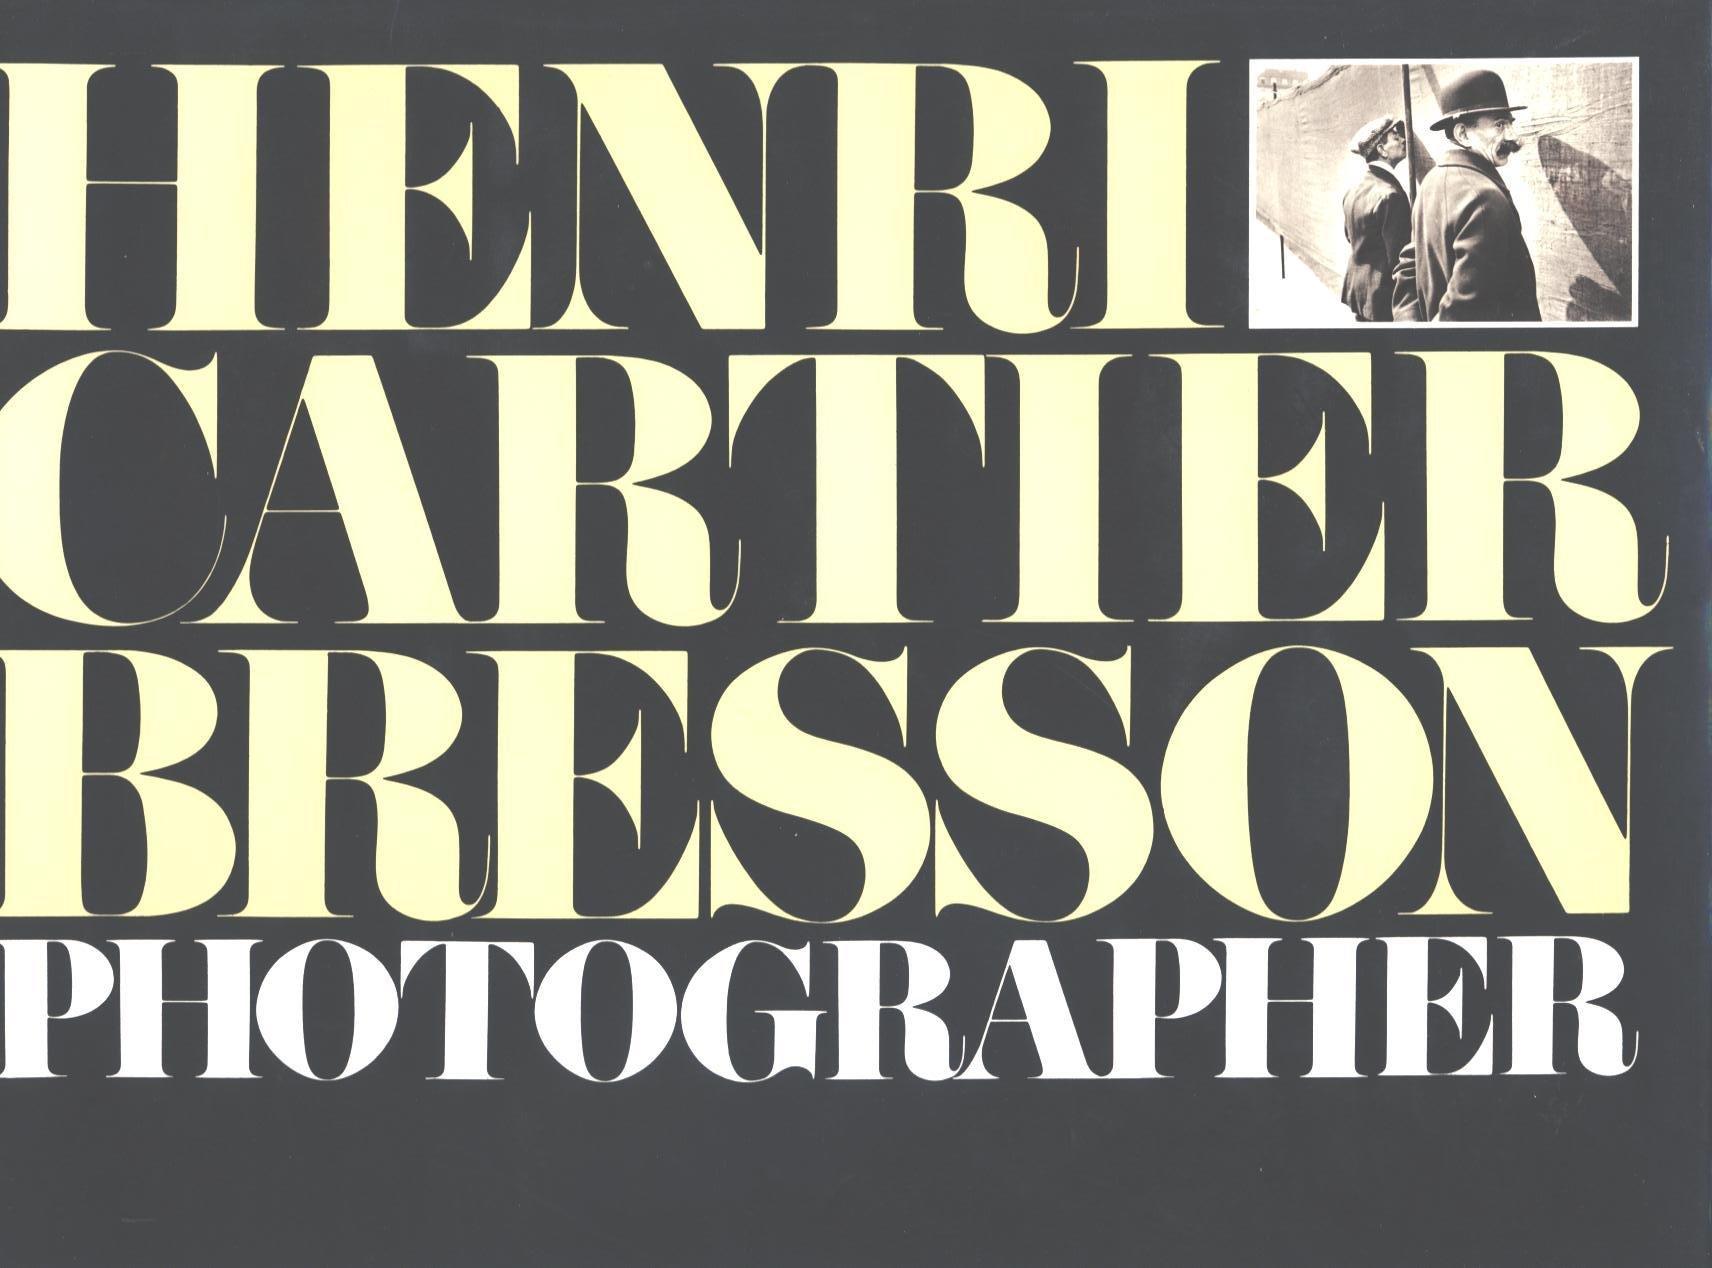 Henri Cartier-Bresson: Photographer pdf epub